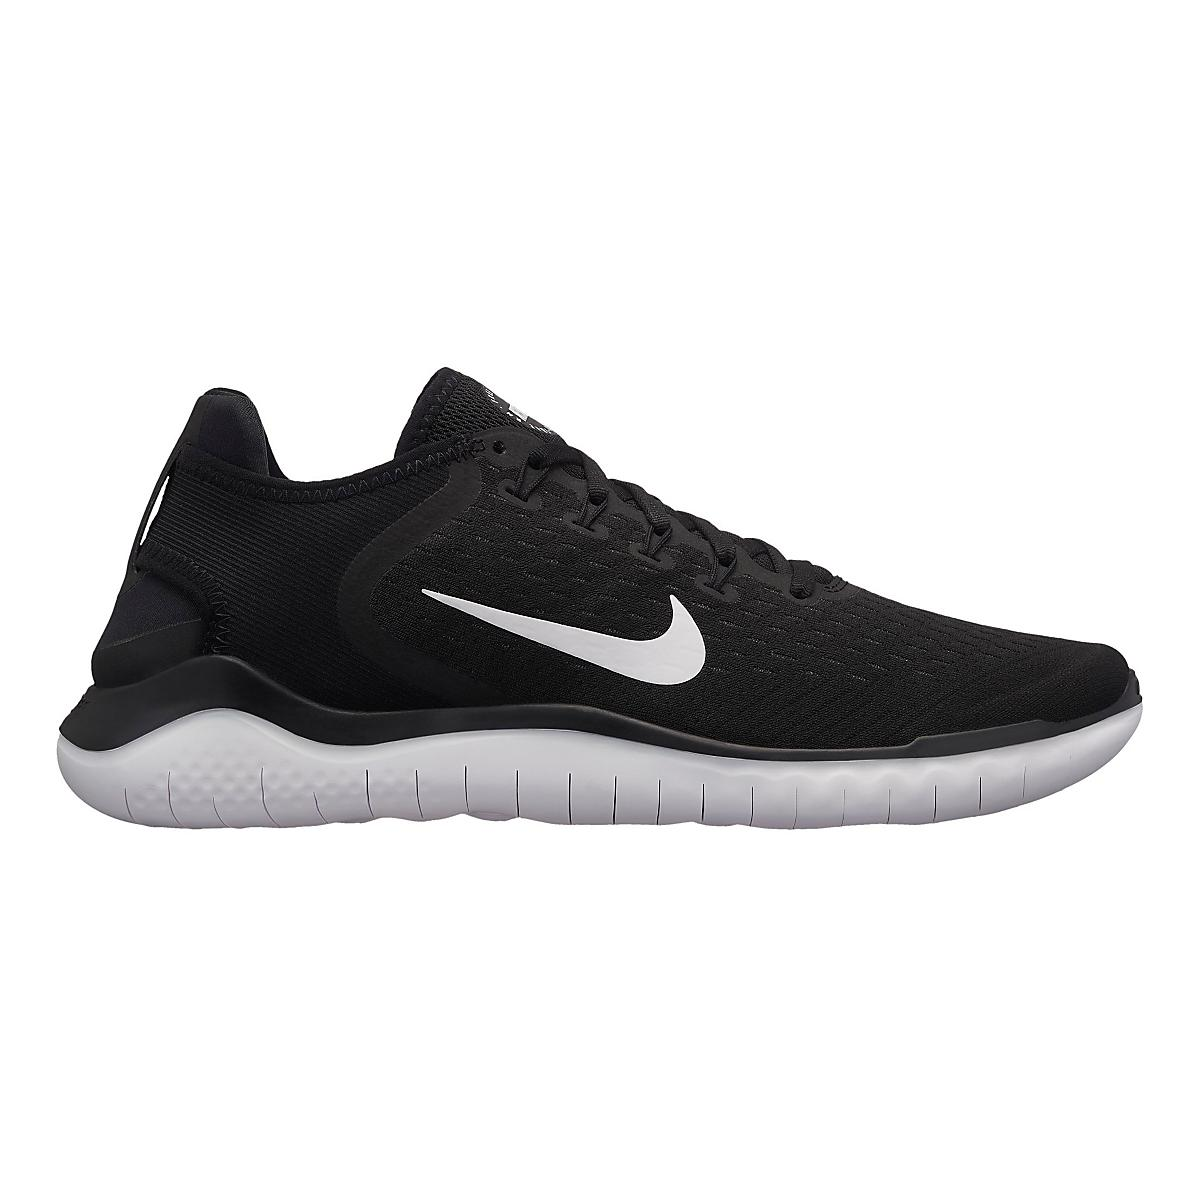 4b2ceab802f Mens Nike Free RN 2018 Running Shoe at Road Runner Sports